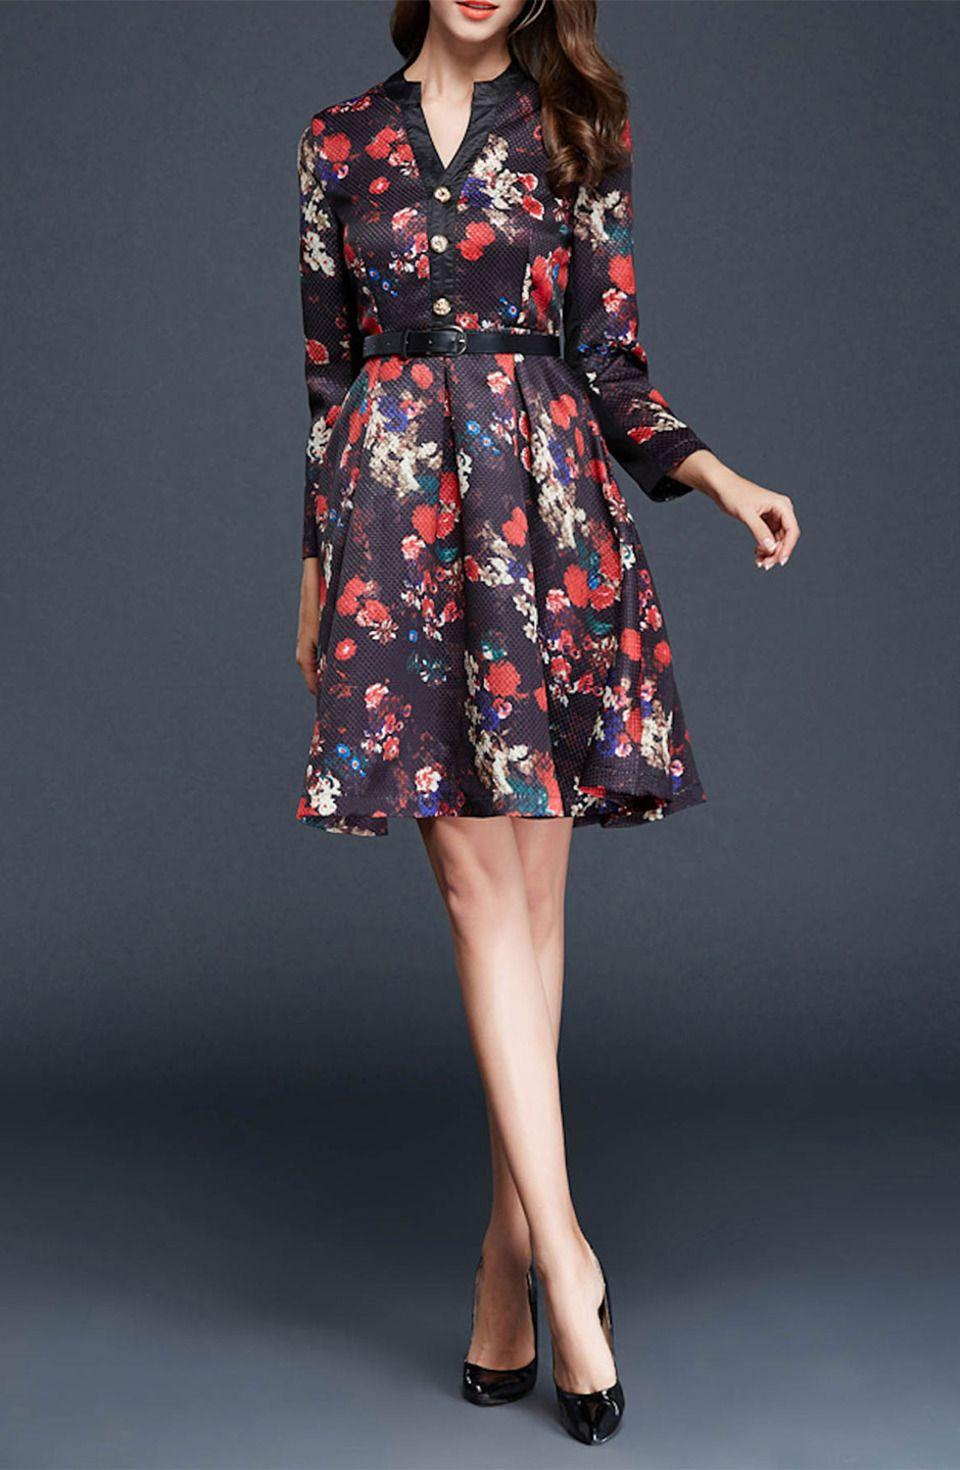 Rudan - Floral Print Placket Dress in Black